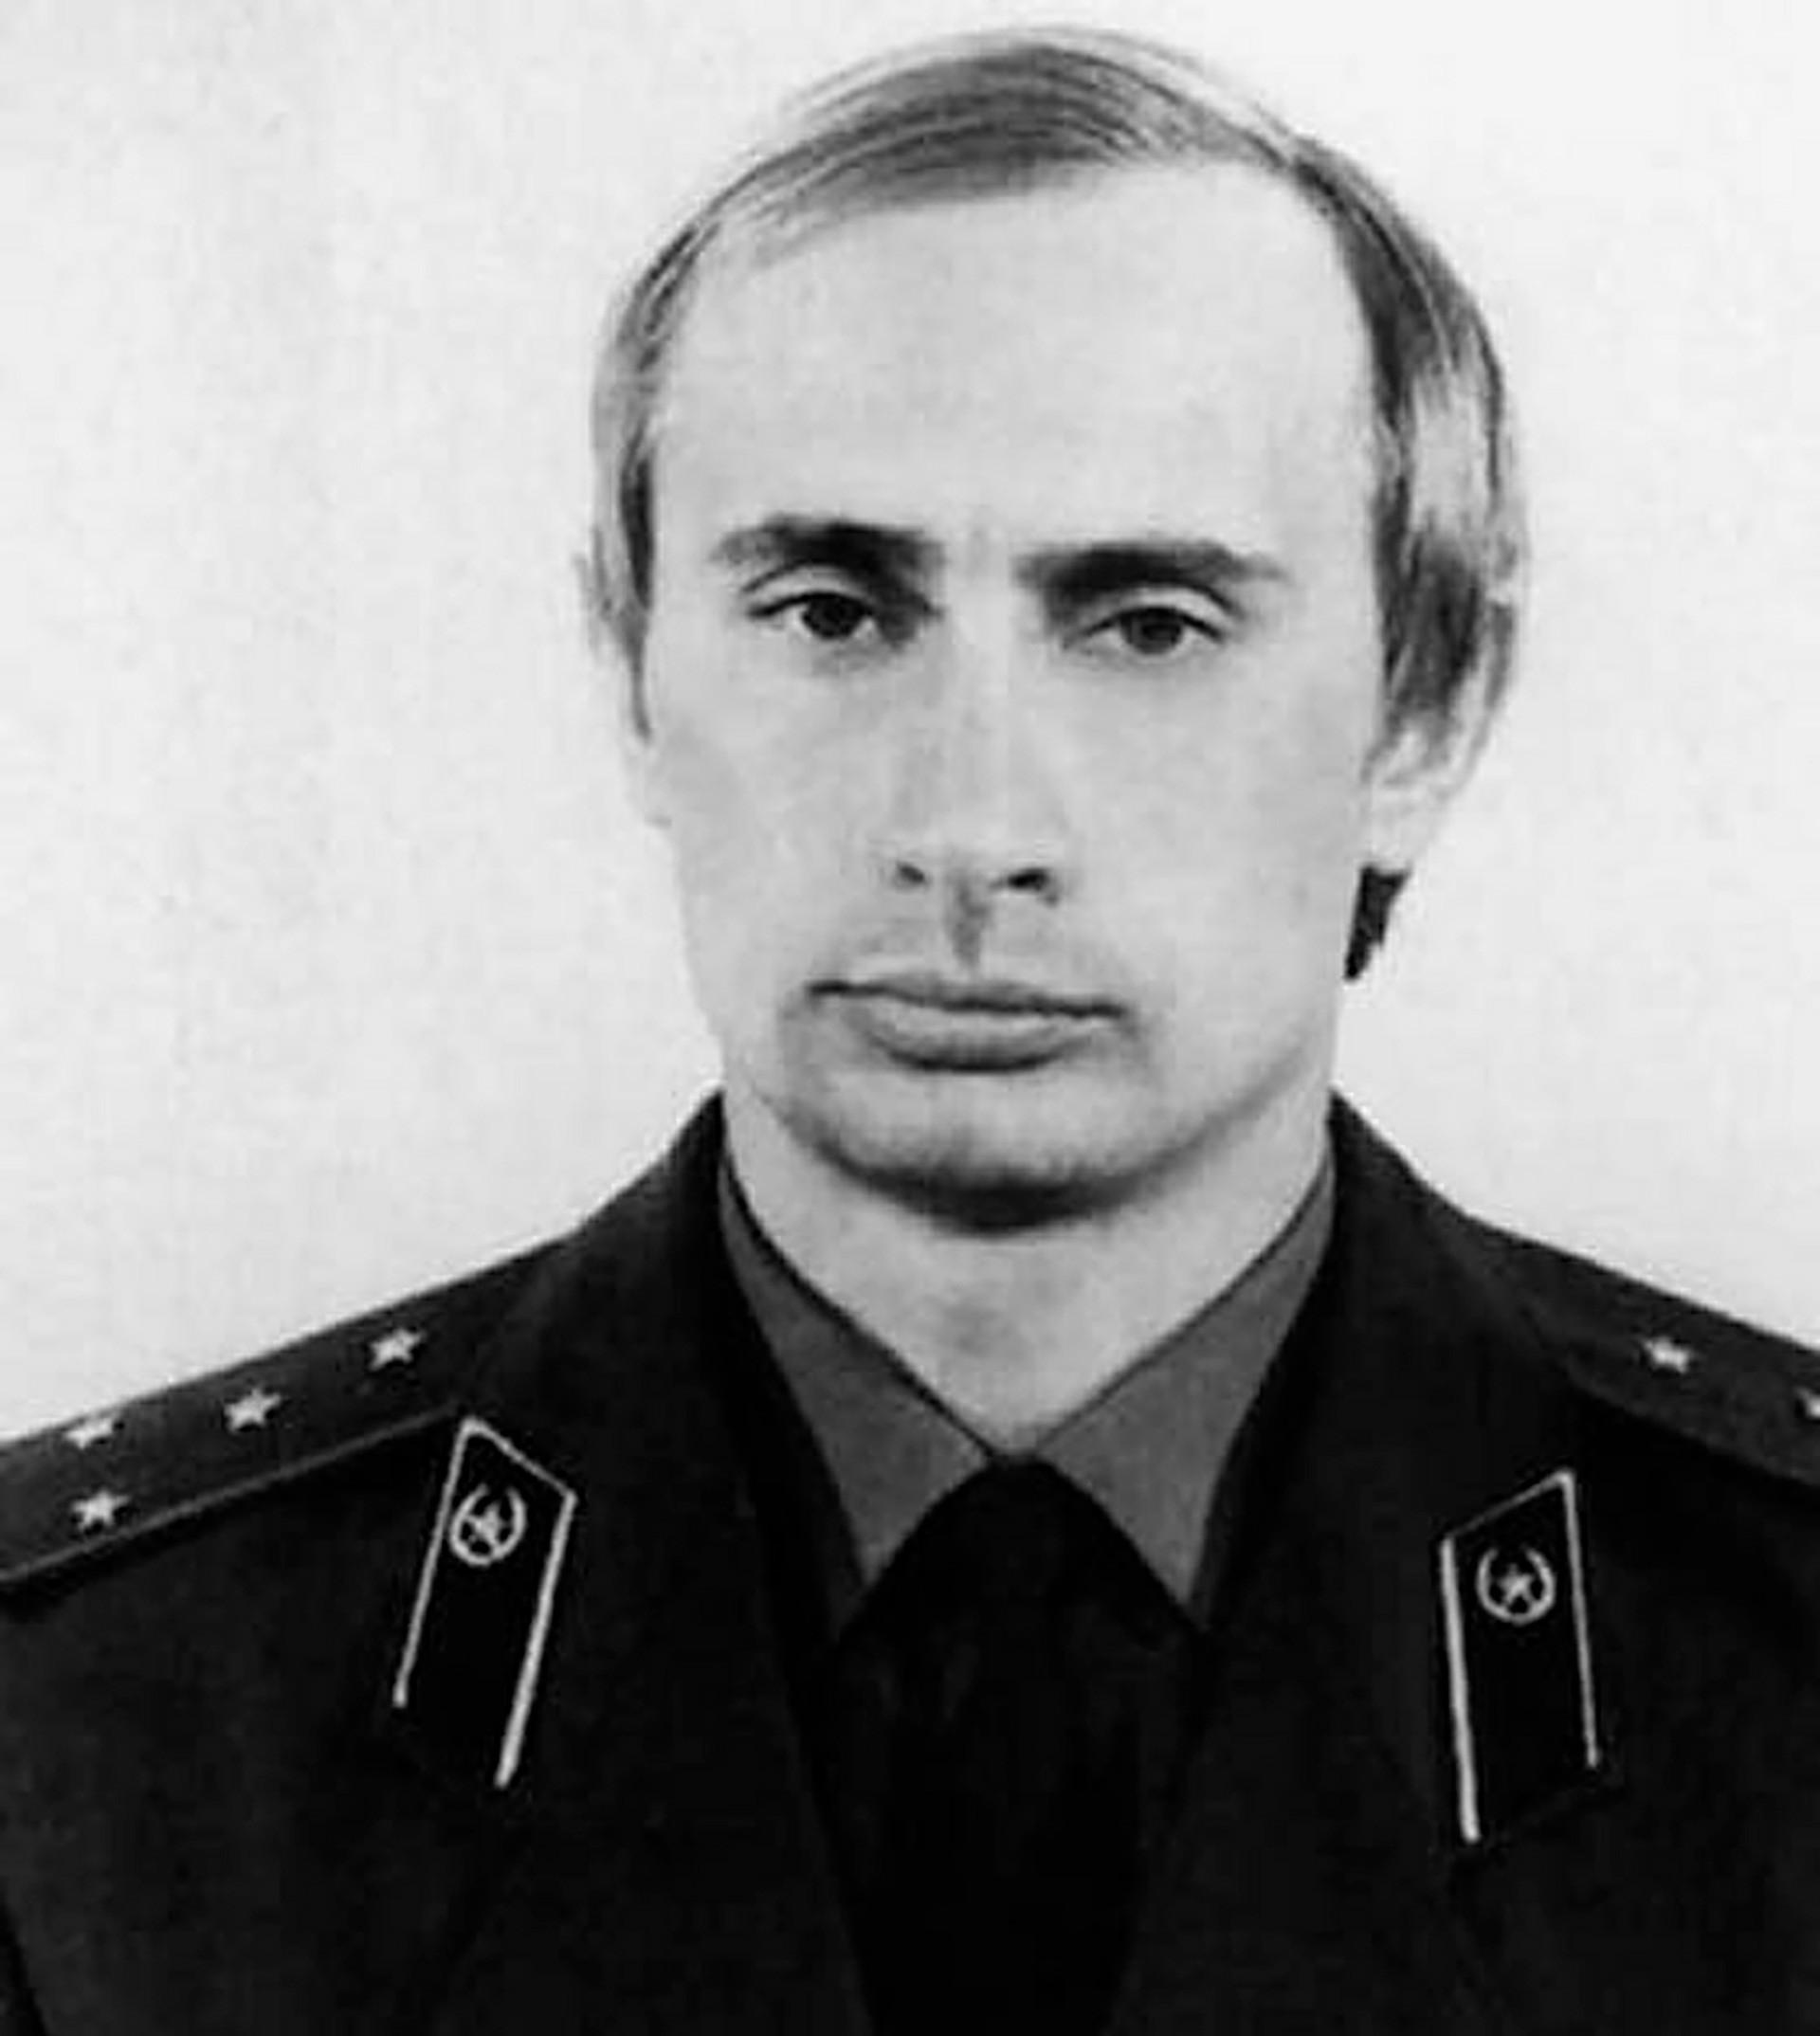 Putin u uniformi KGB-a, oko 1980.